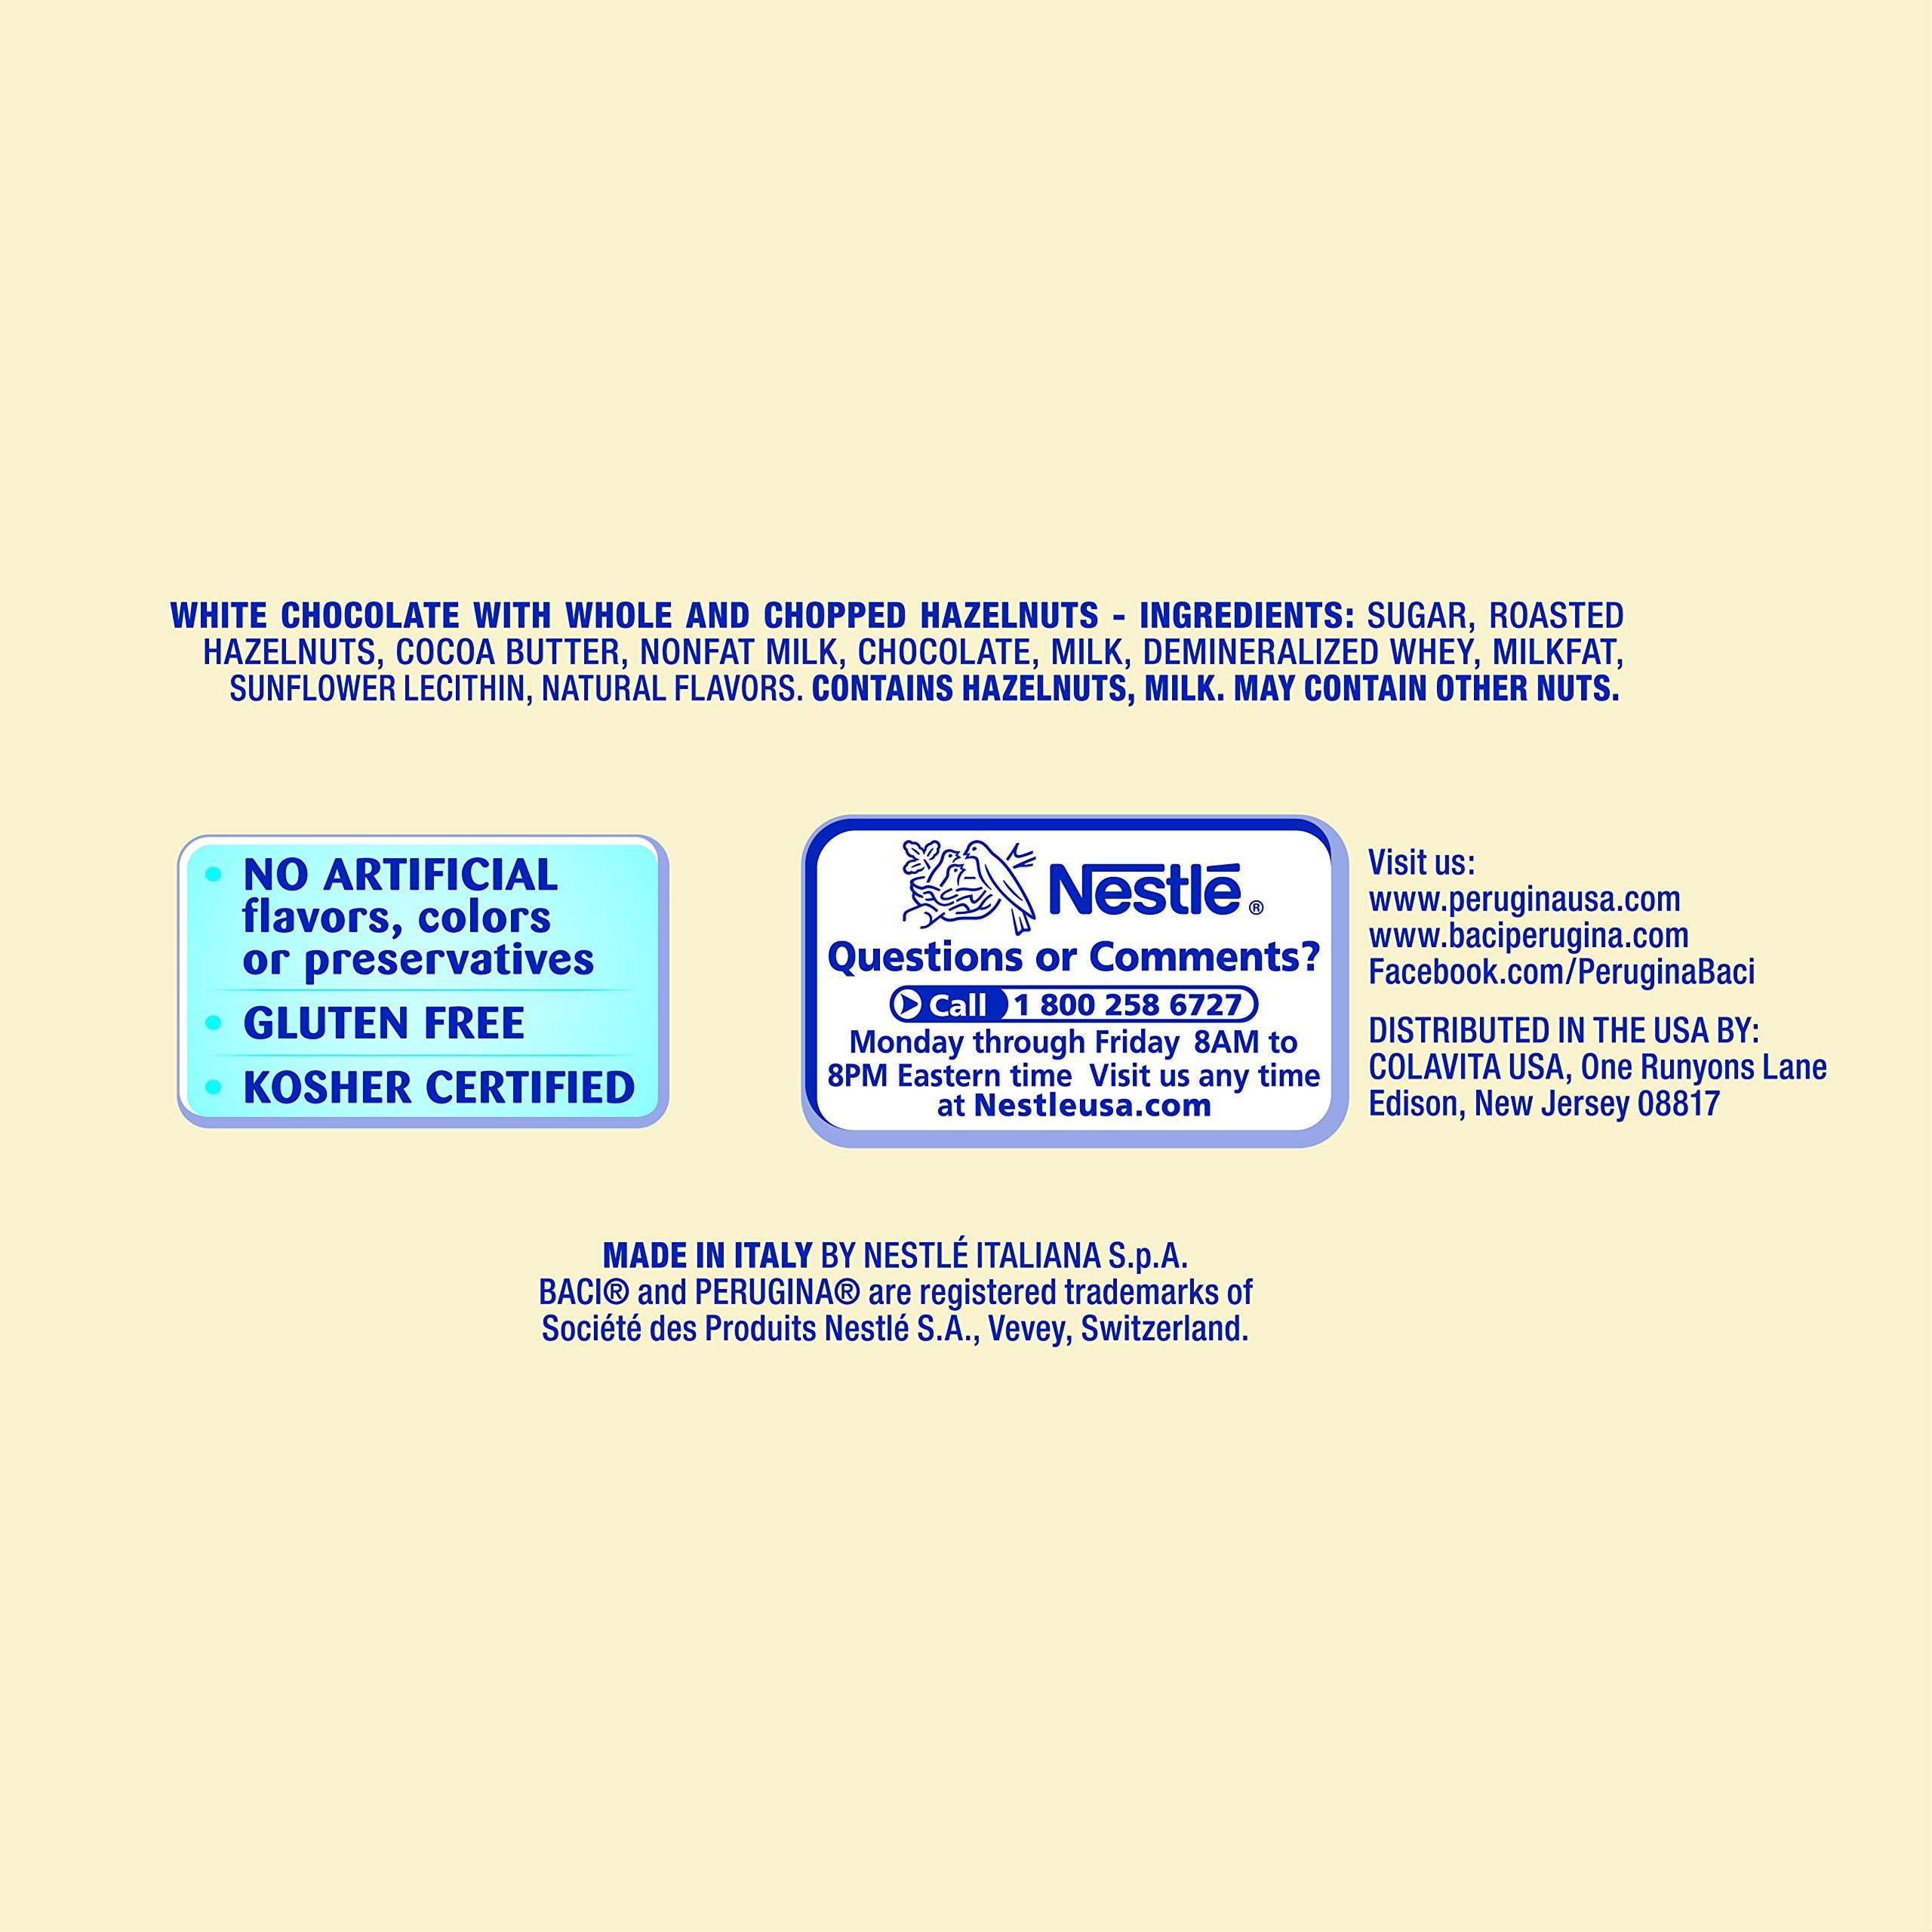 Perugina Baci Chocolate Bulk Box, White, 6.6 Pound by Perugina (Image #2)